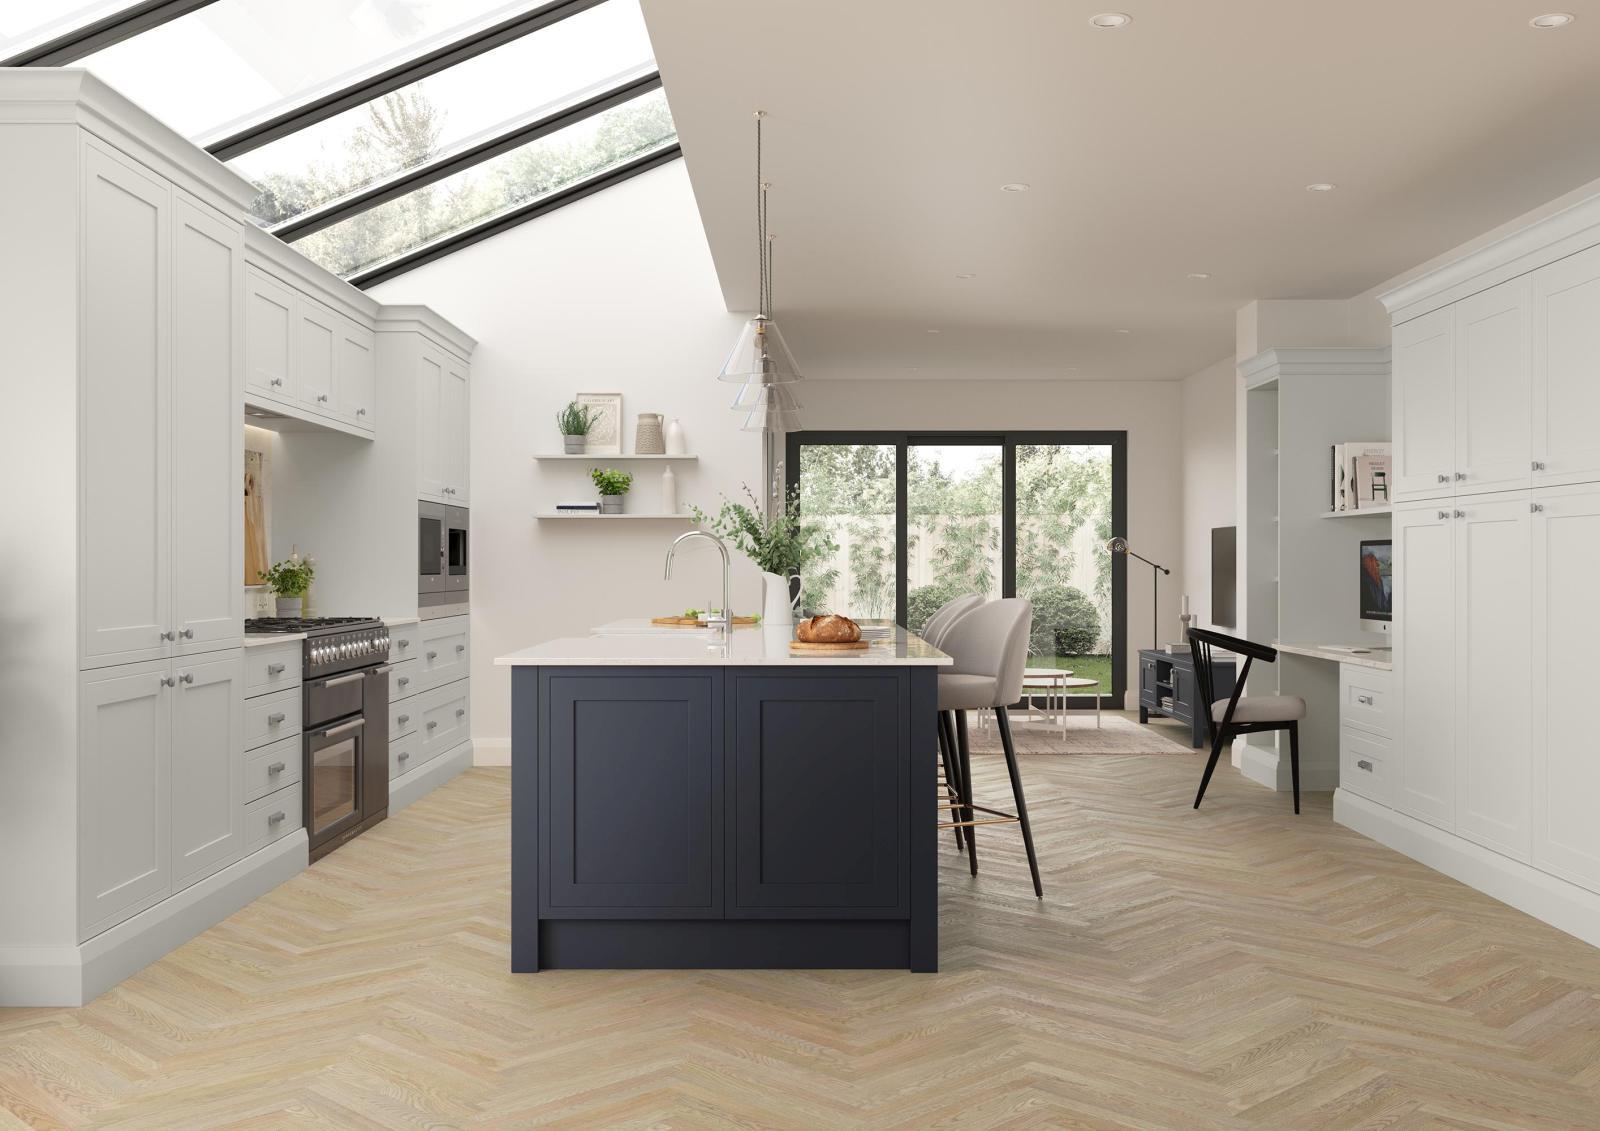 Mock Inframe shaker style kitchen painted matte slate blue and light grey